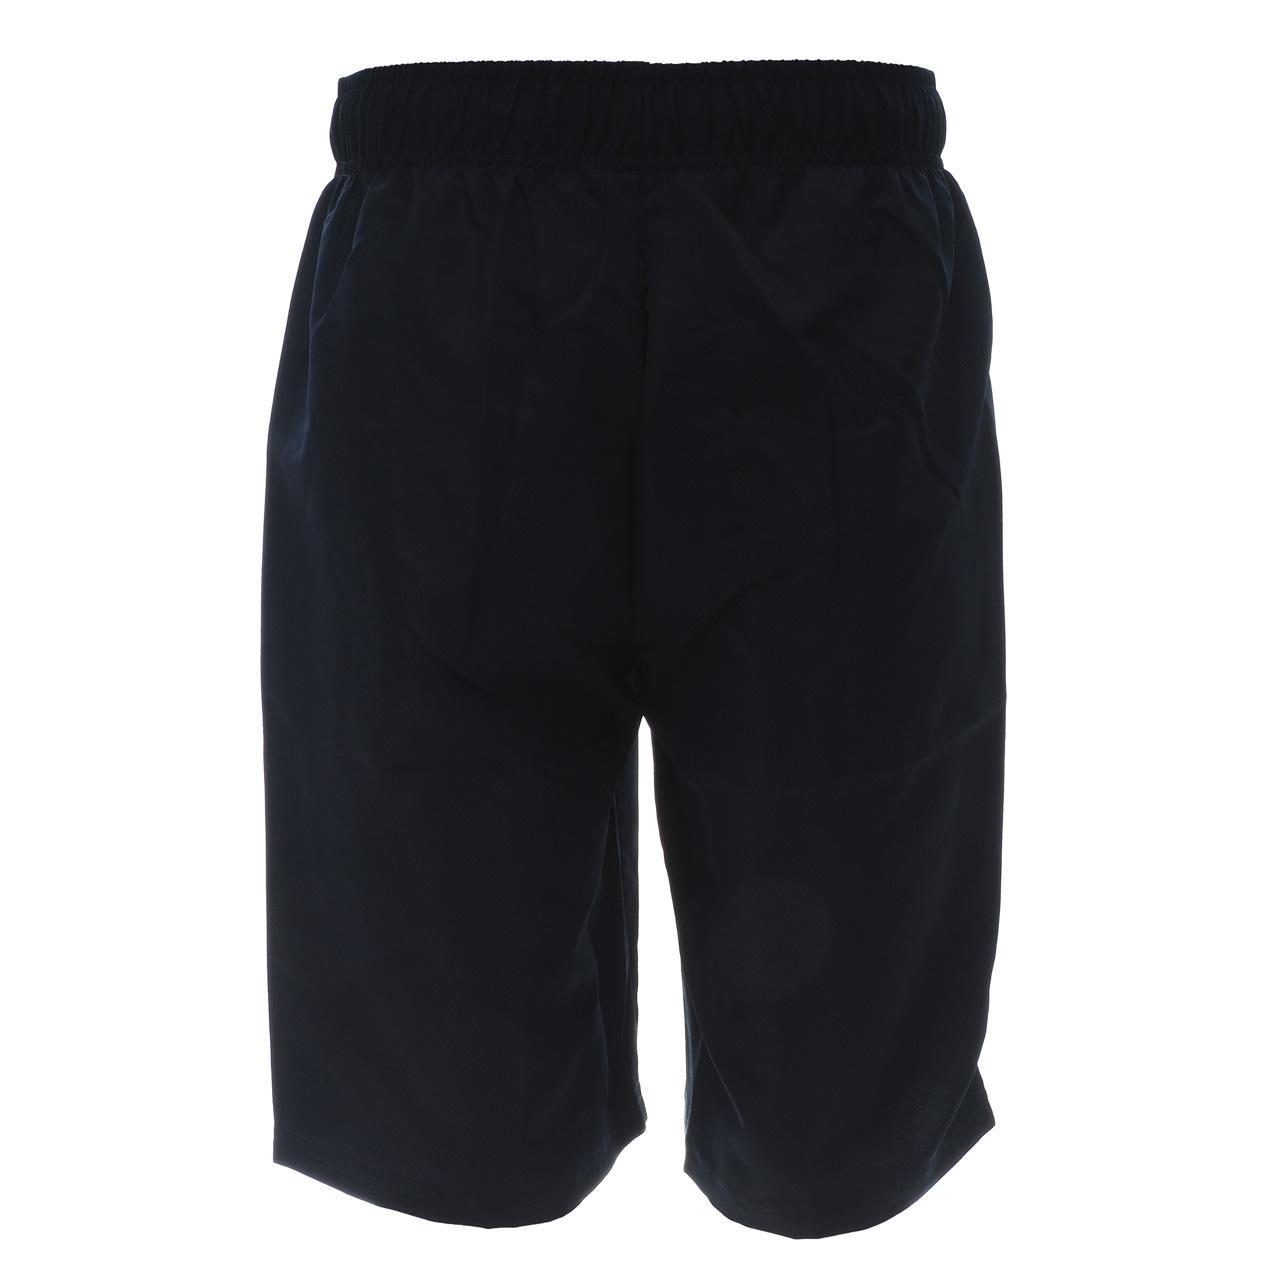 Bermuda-Shorts-Lotto-Logo-Navy-Bermuda-Blue-17798-New thumbnail 5